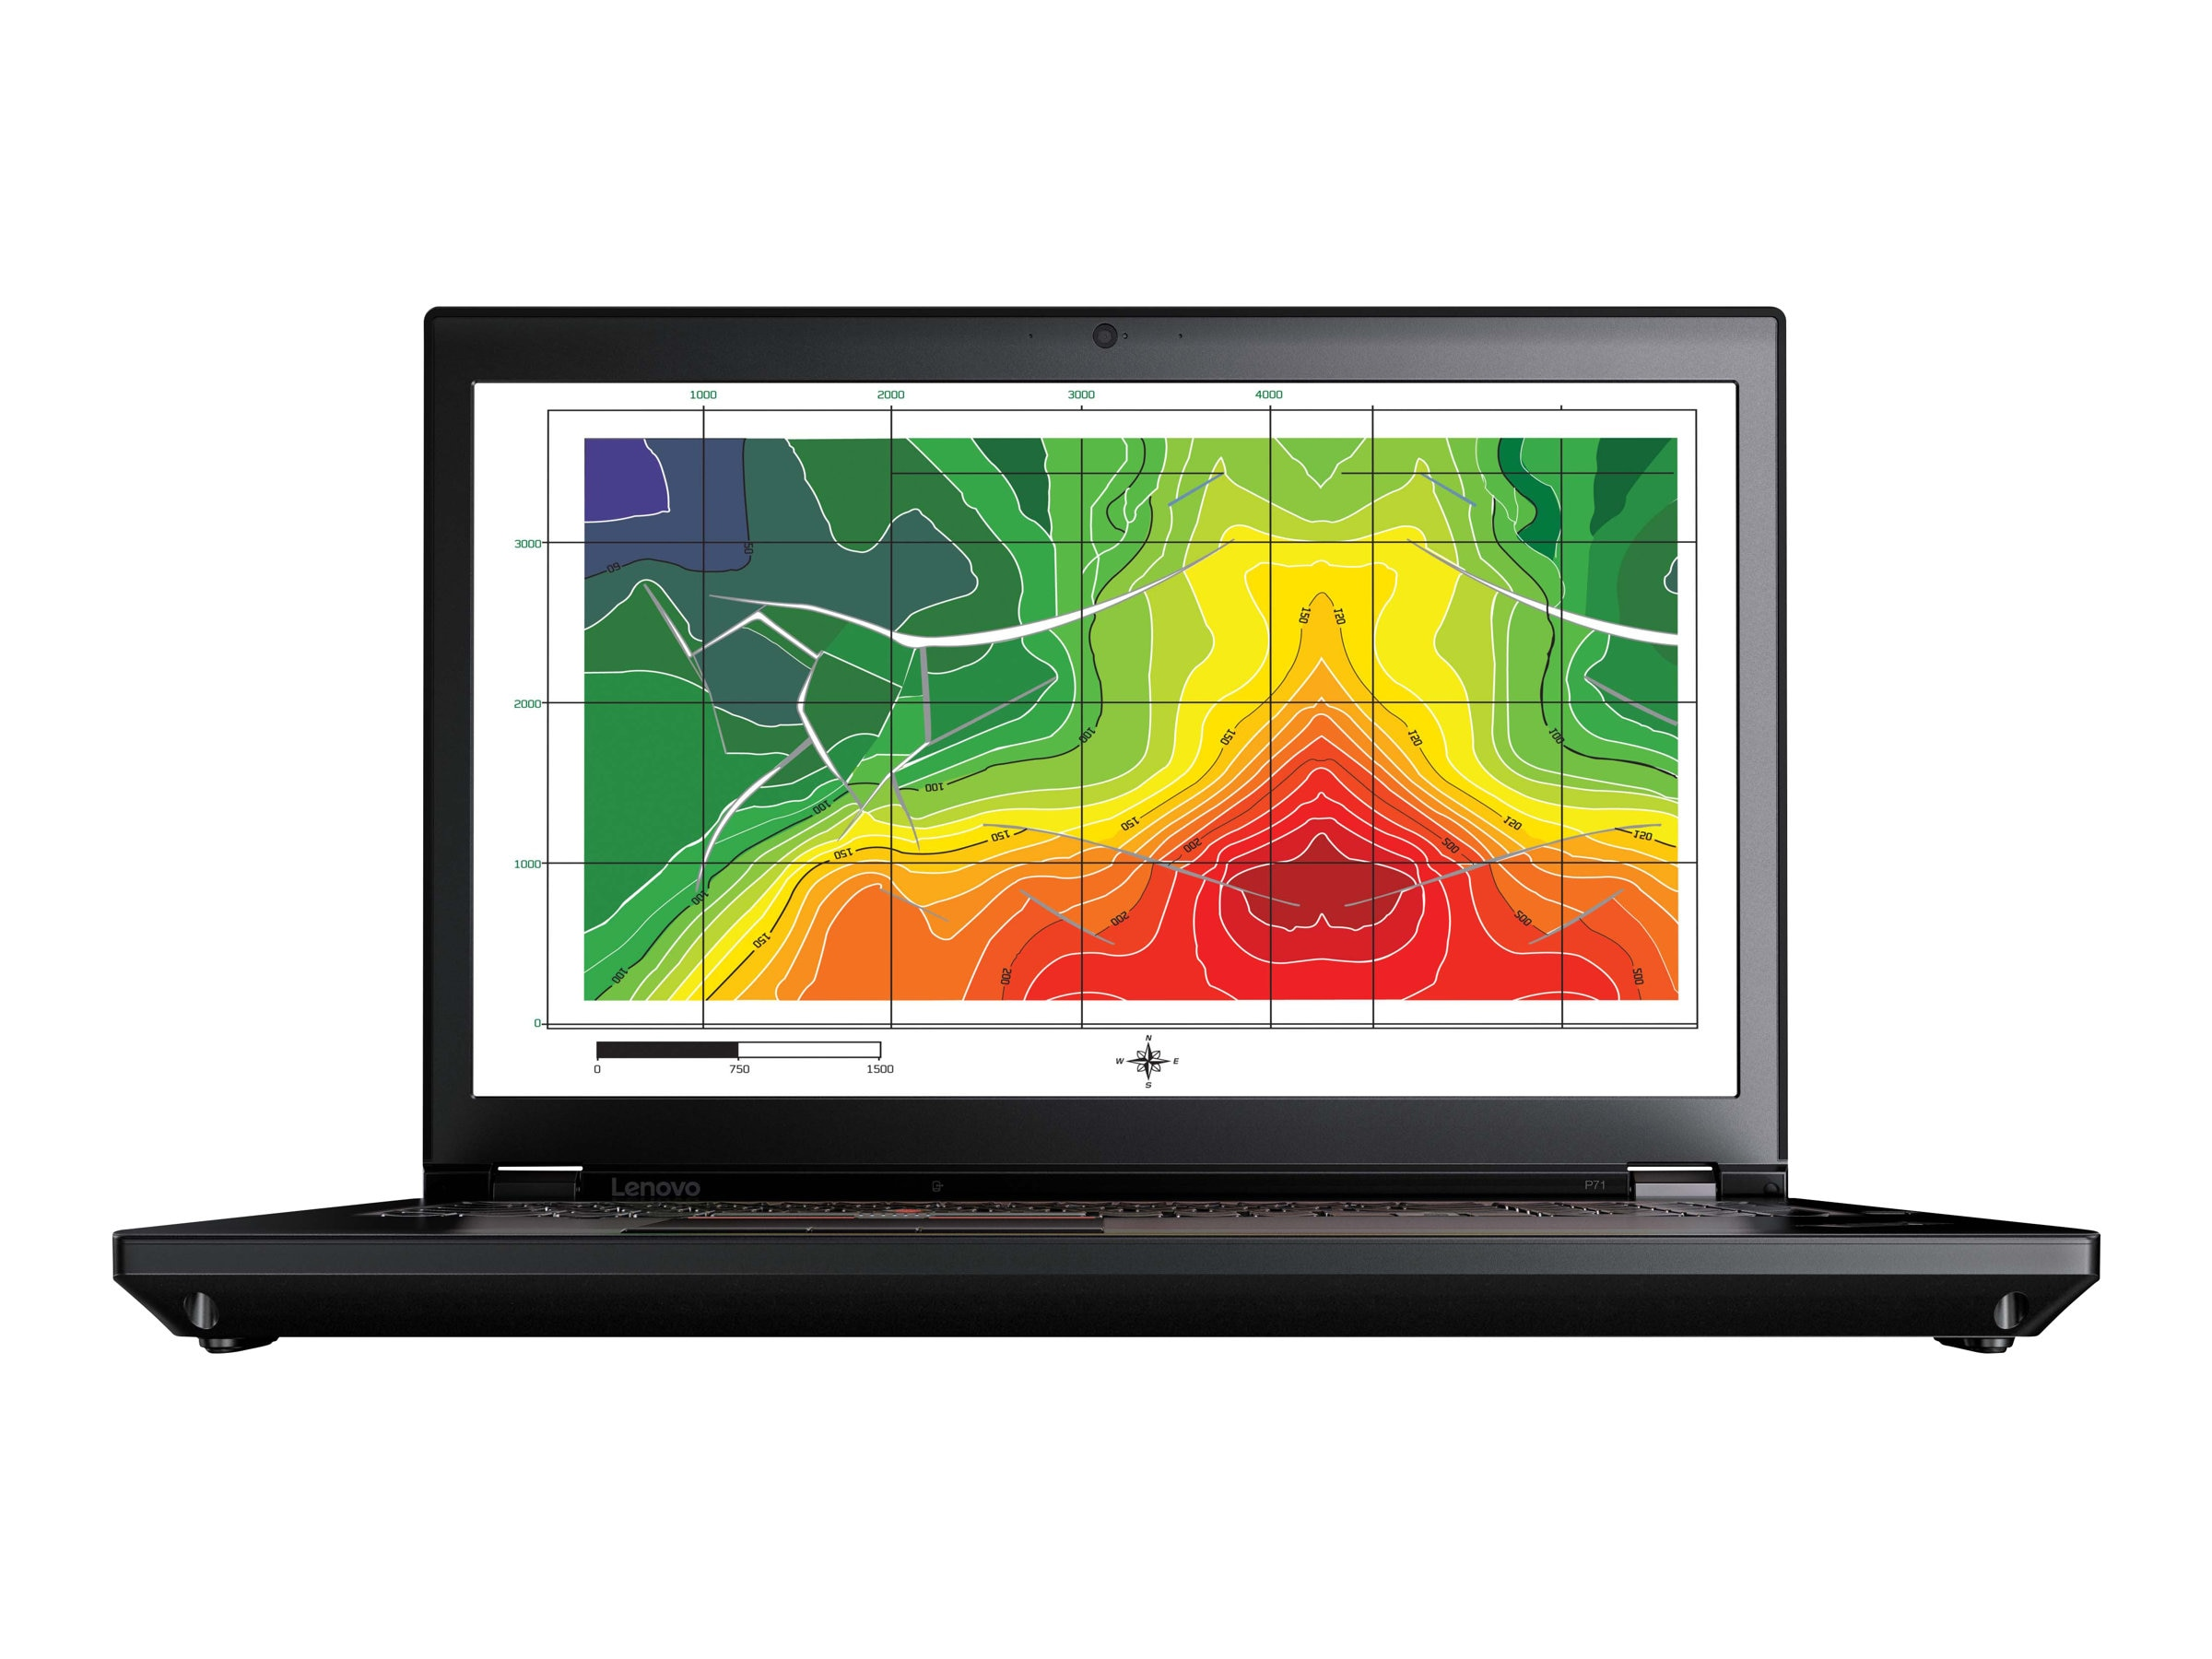 Lenovo TopSeller ThinkPad P71 Core i7-7820HQ 2.9GHz 8GB 256GB PCIe ac BT FR M620M 17.3 FHD W10P64